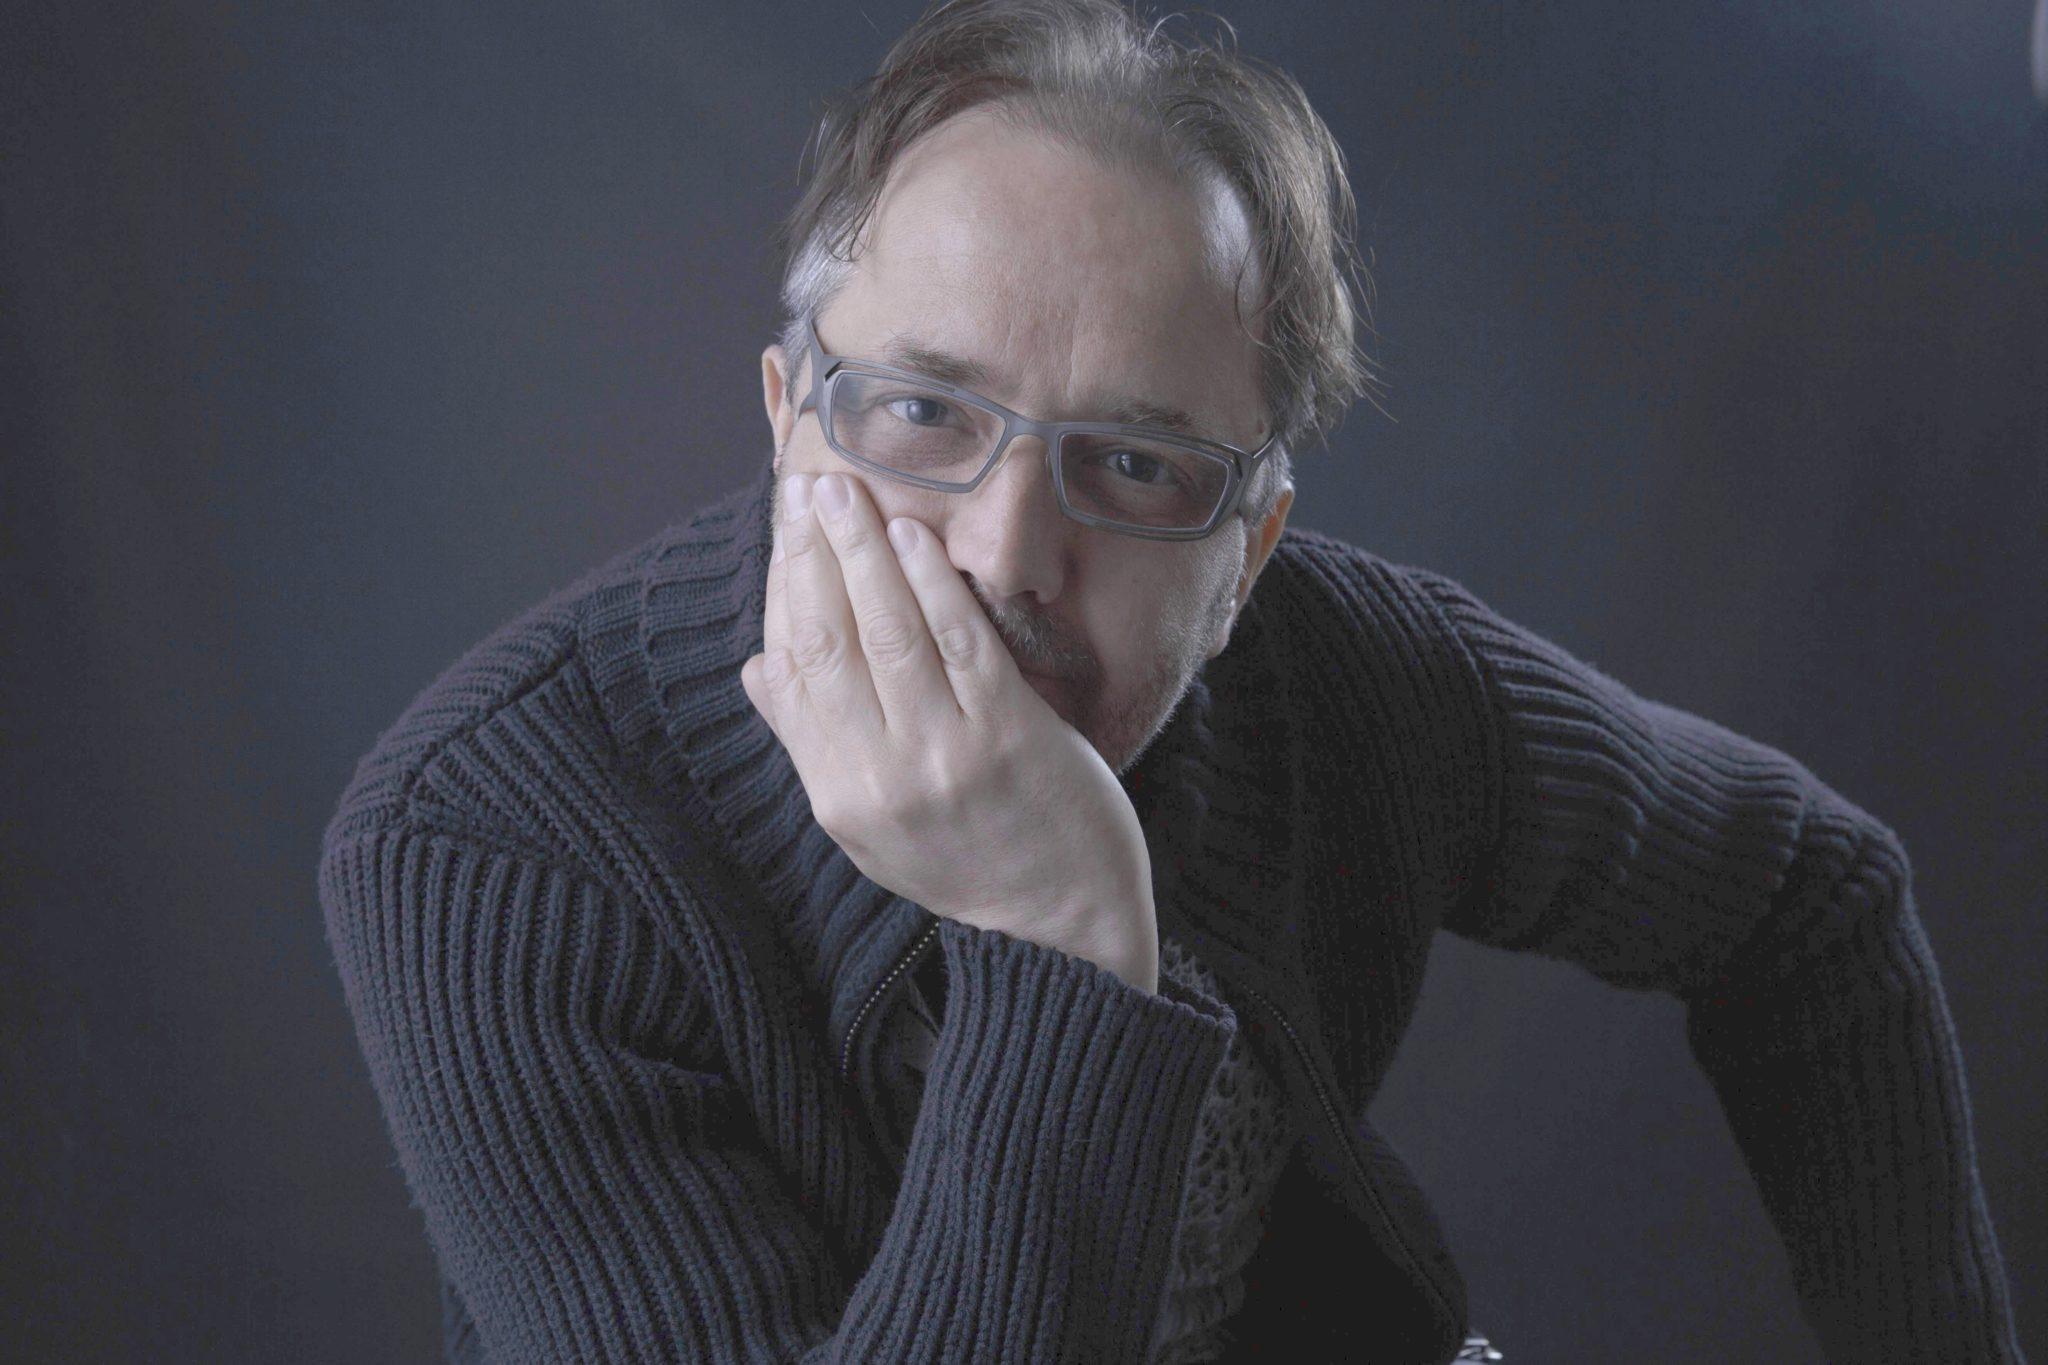 Martin Kublák